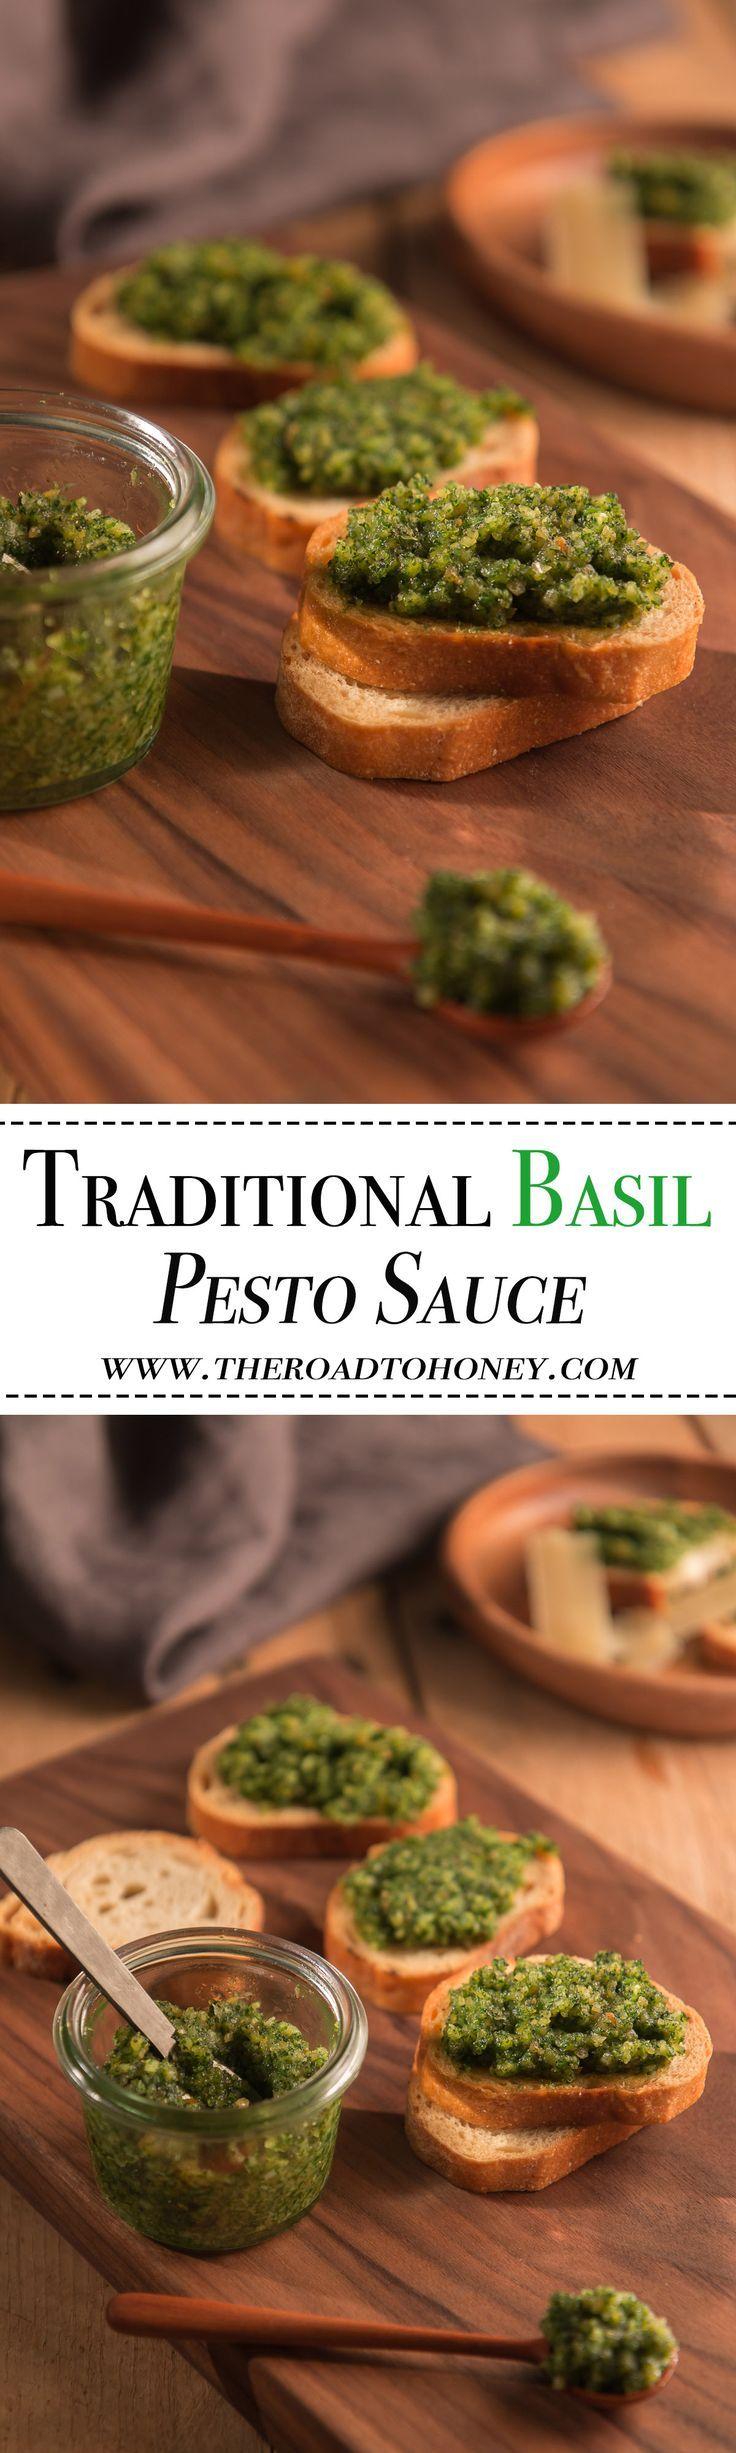 Traditional Basil Pesto Sauce